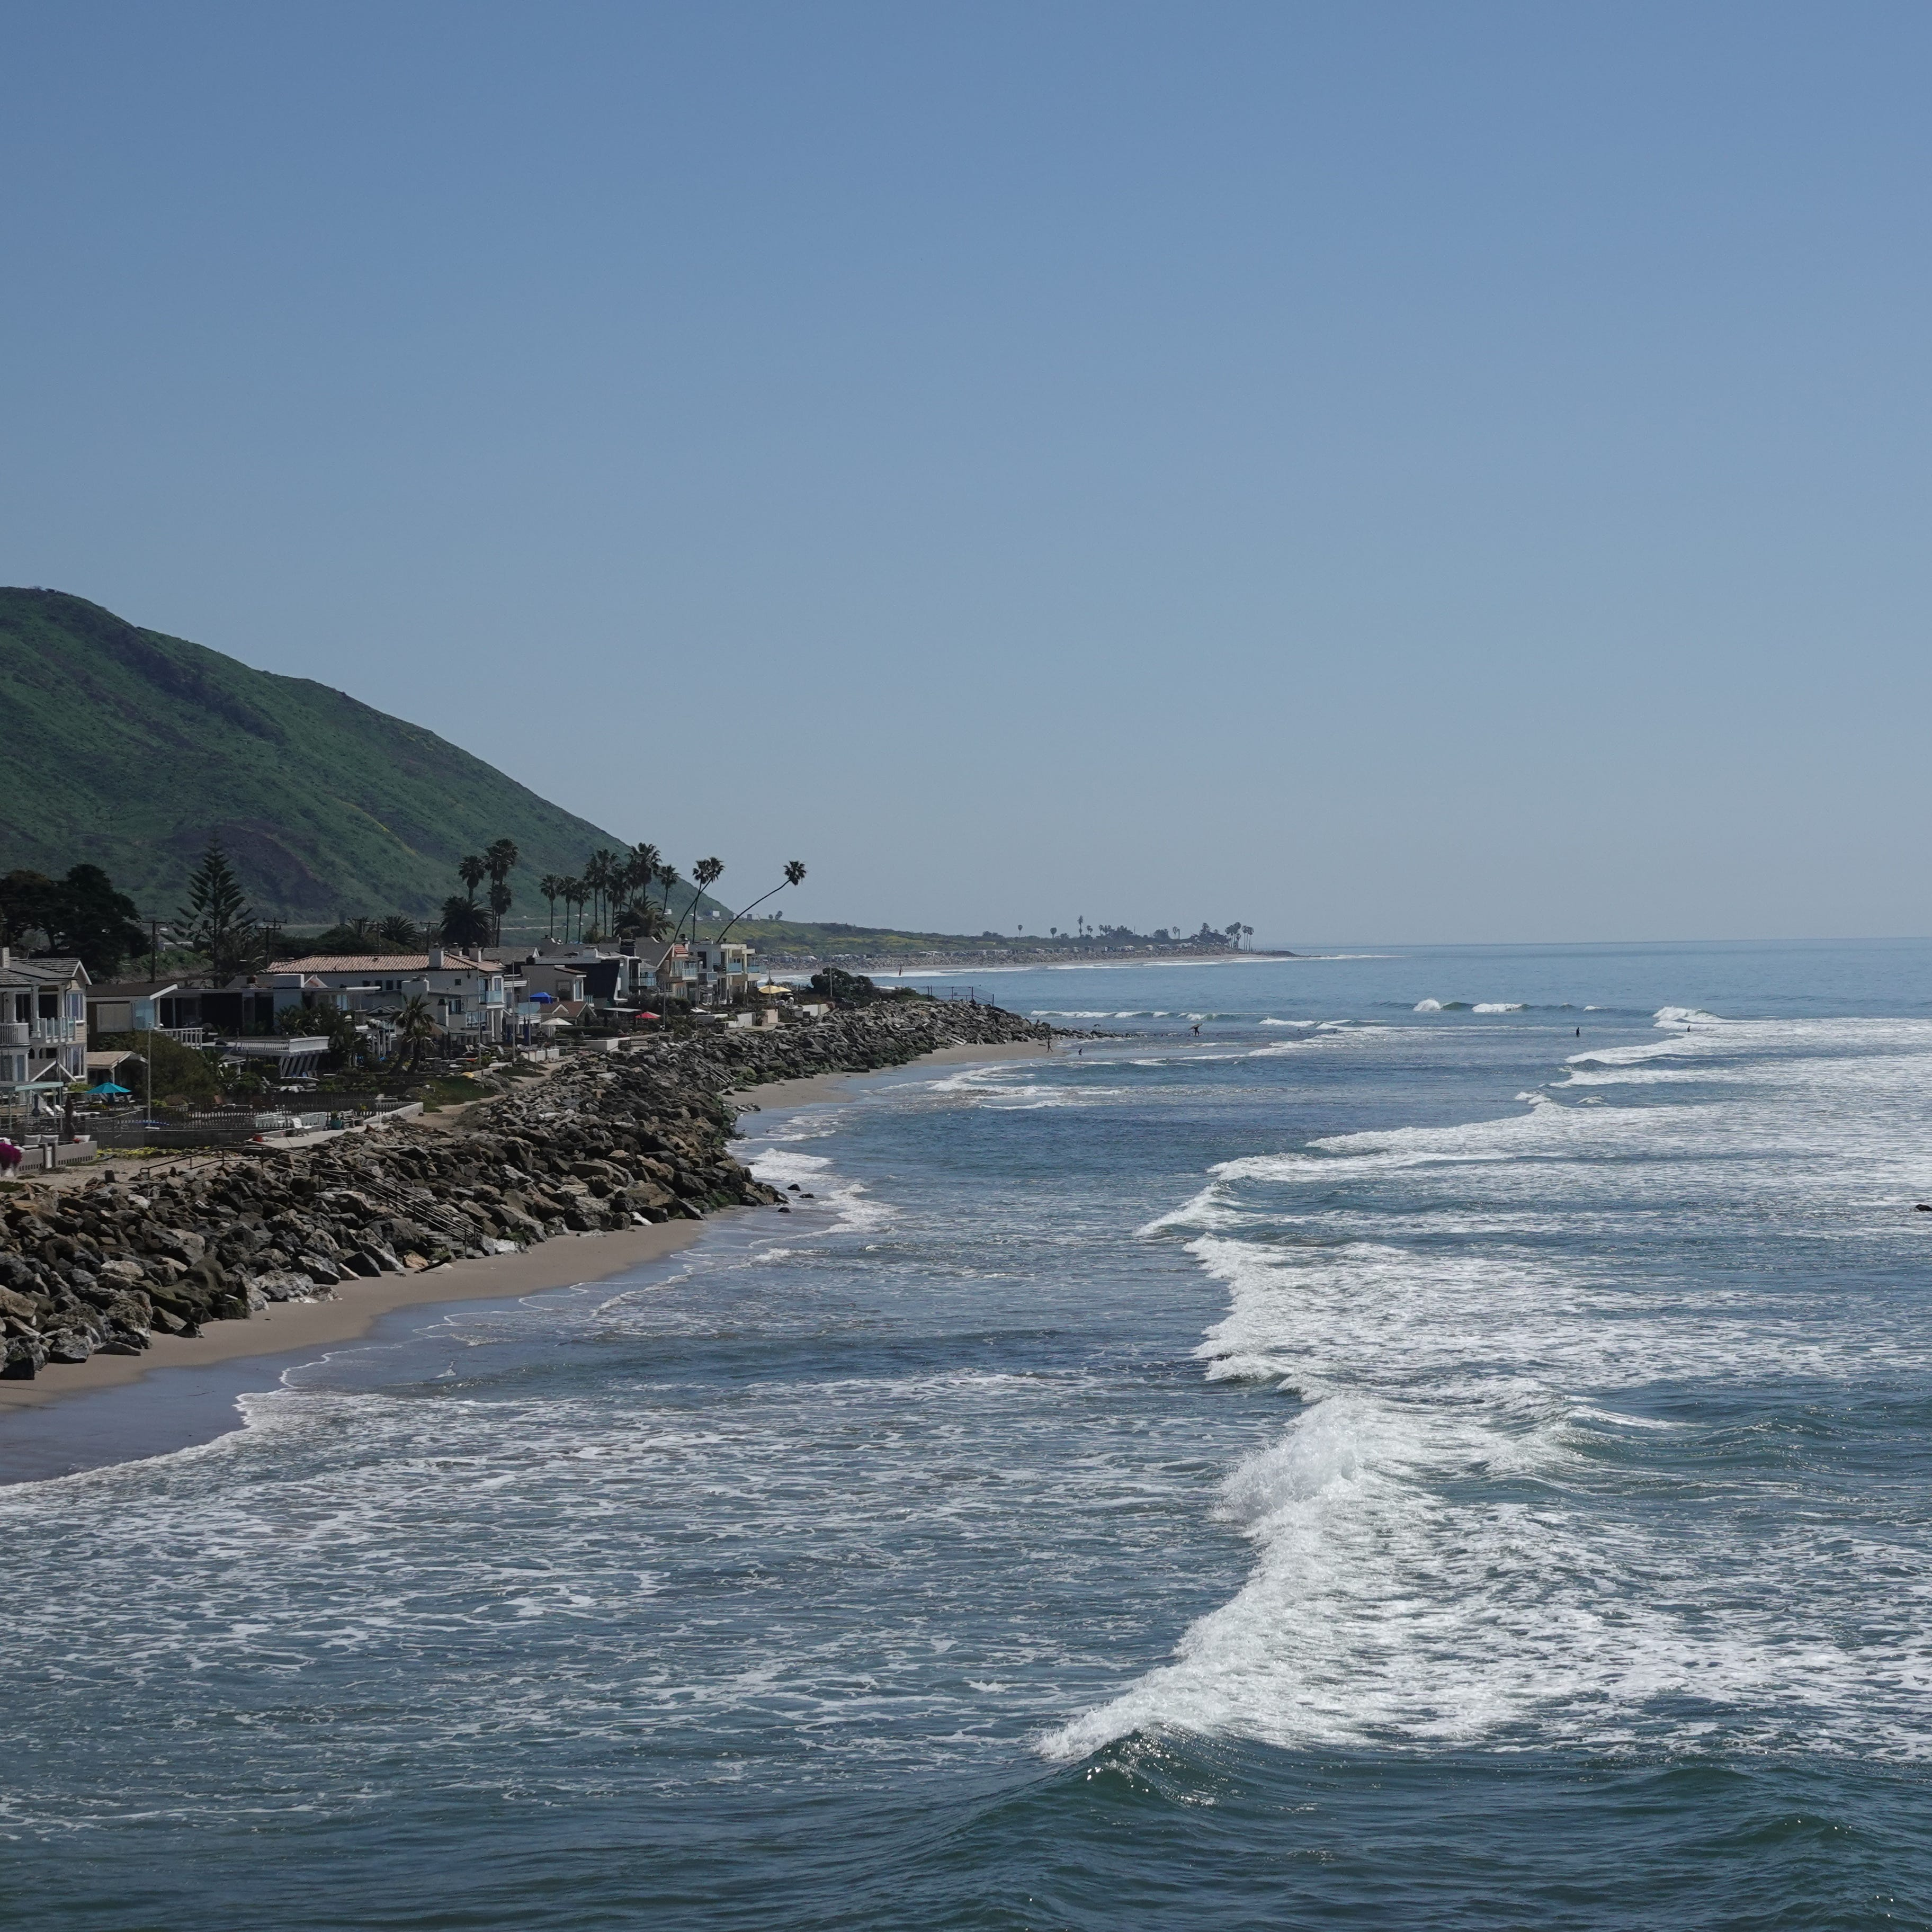 Wind danger dies down in Ventura County, but beach hazards remain